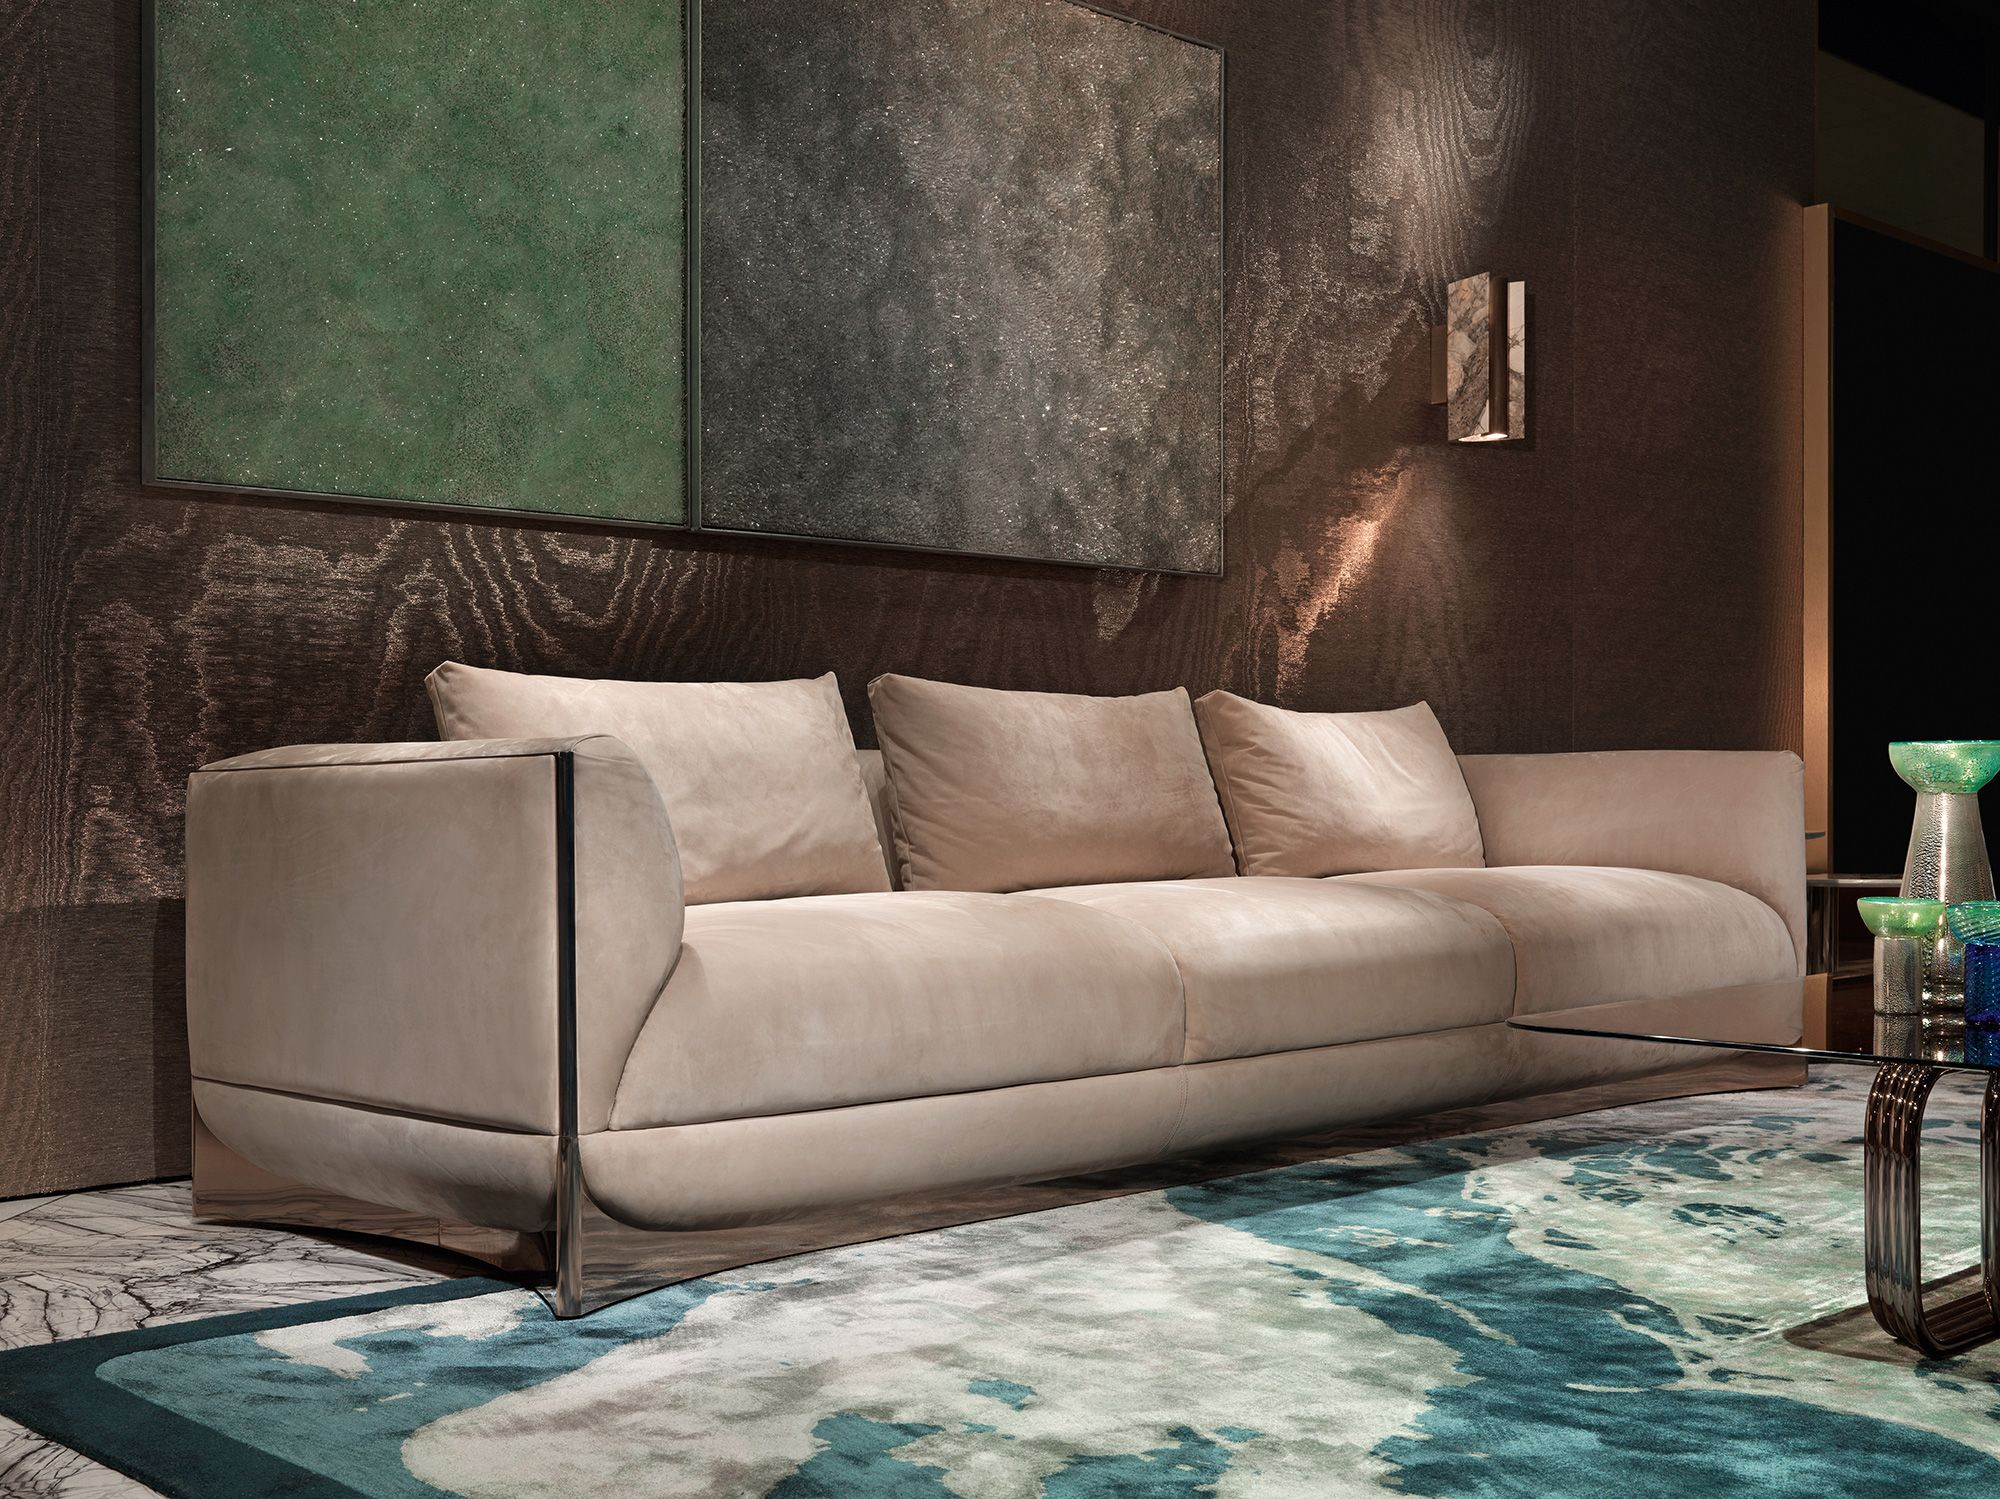 Ca Foscari Livingroom Design Alessandro La Spada Furniture Sofa Design Modern Houses Interior